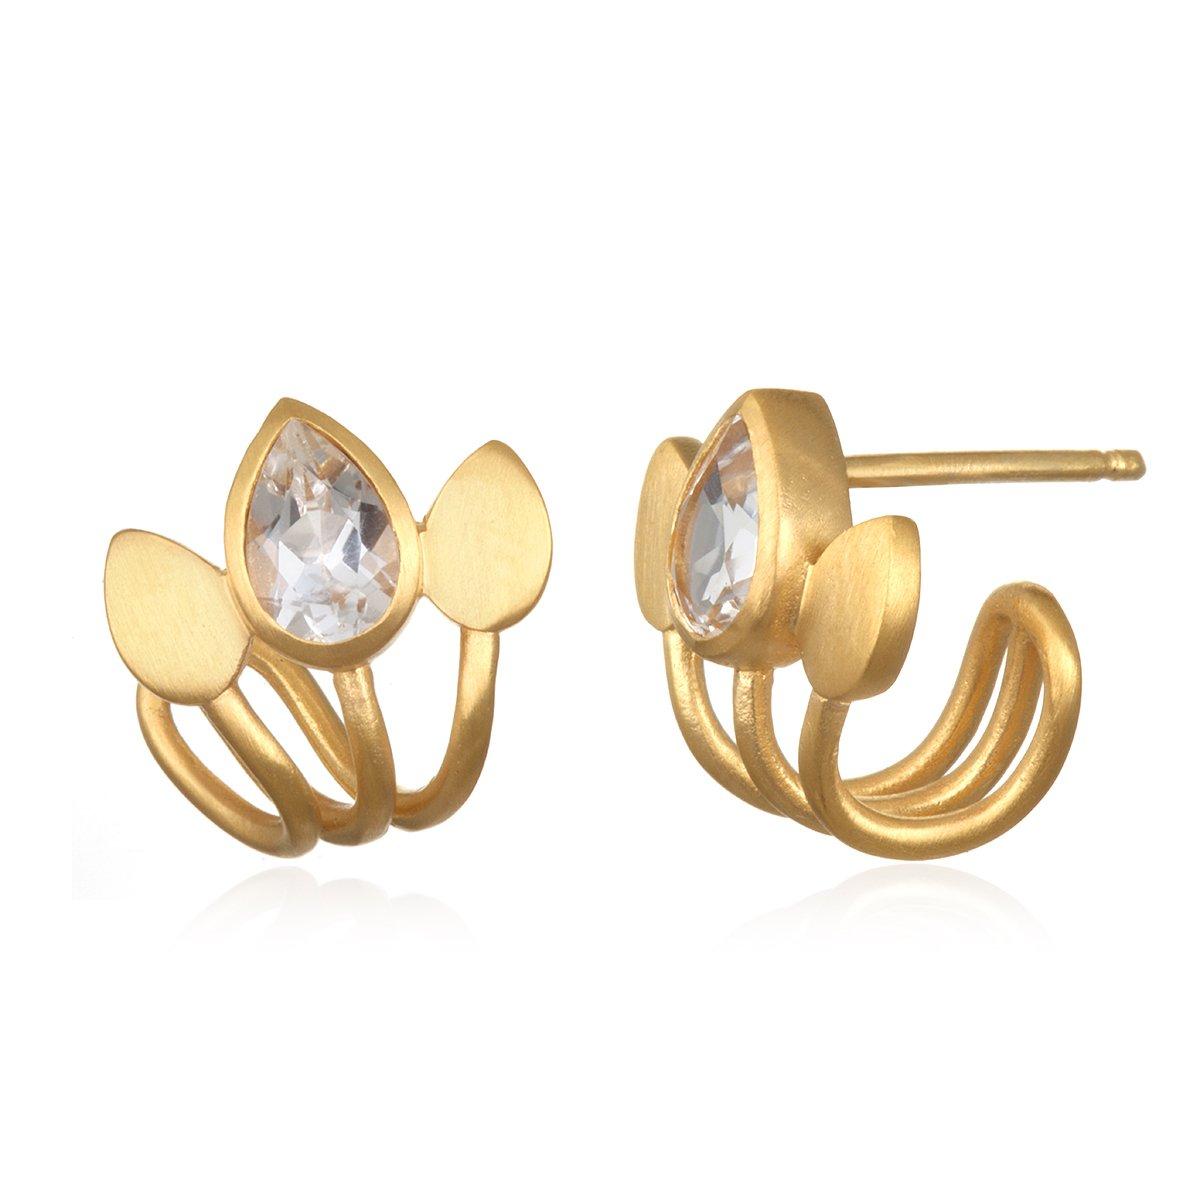 Satya Jewelry Womens White Topaz Gold Lotus Cuff Earrings, One Size